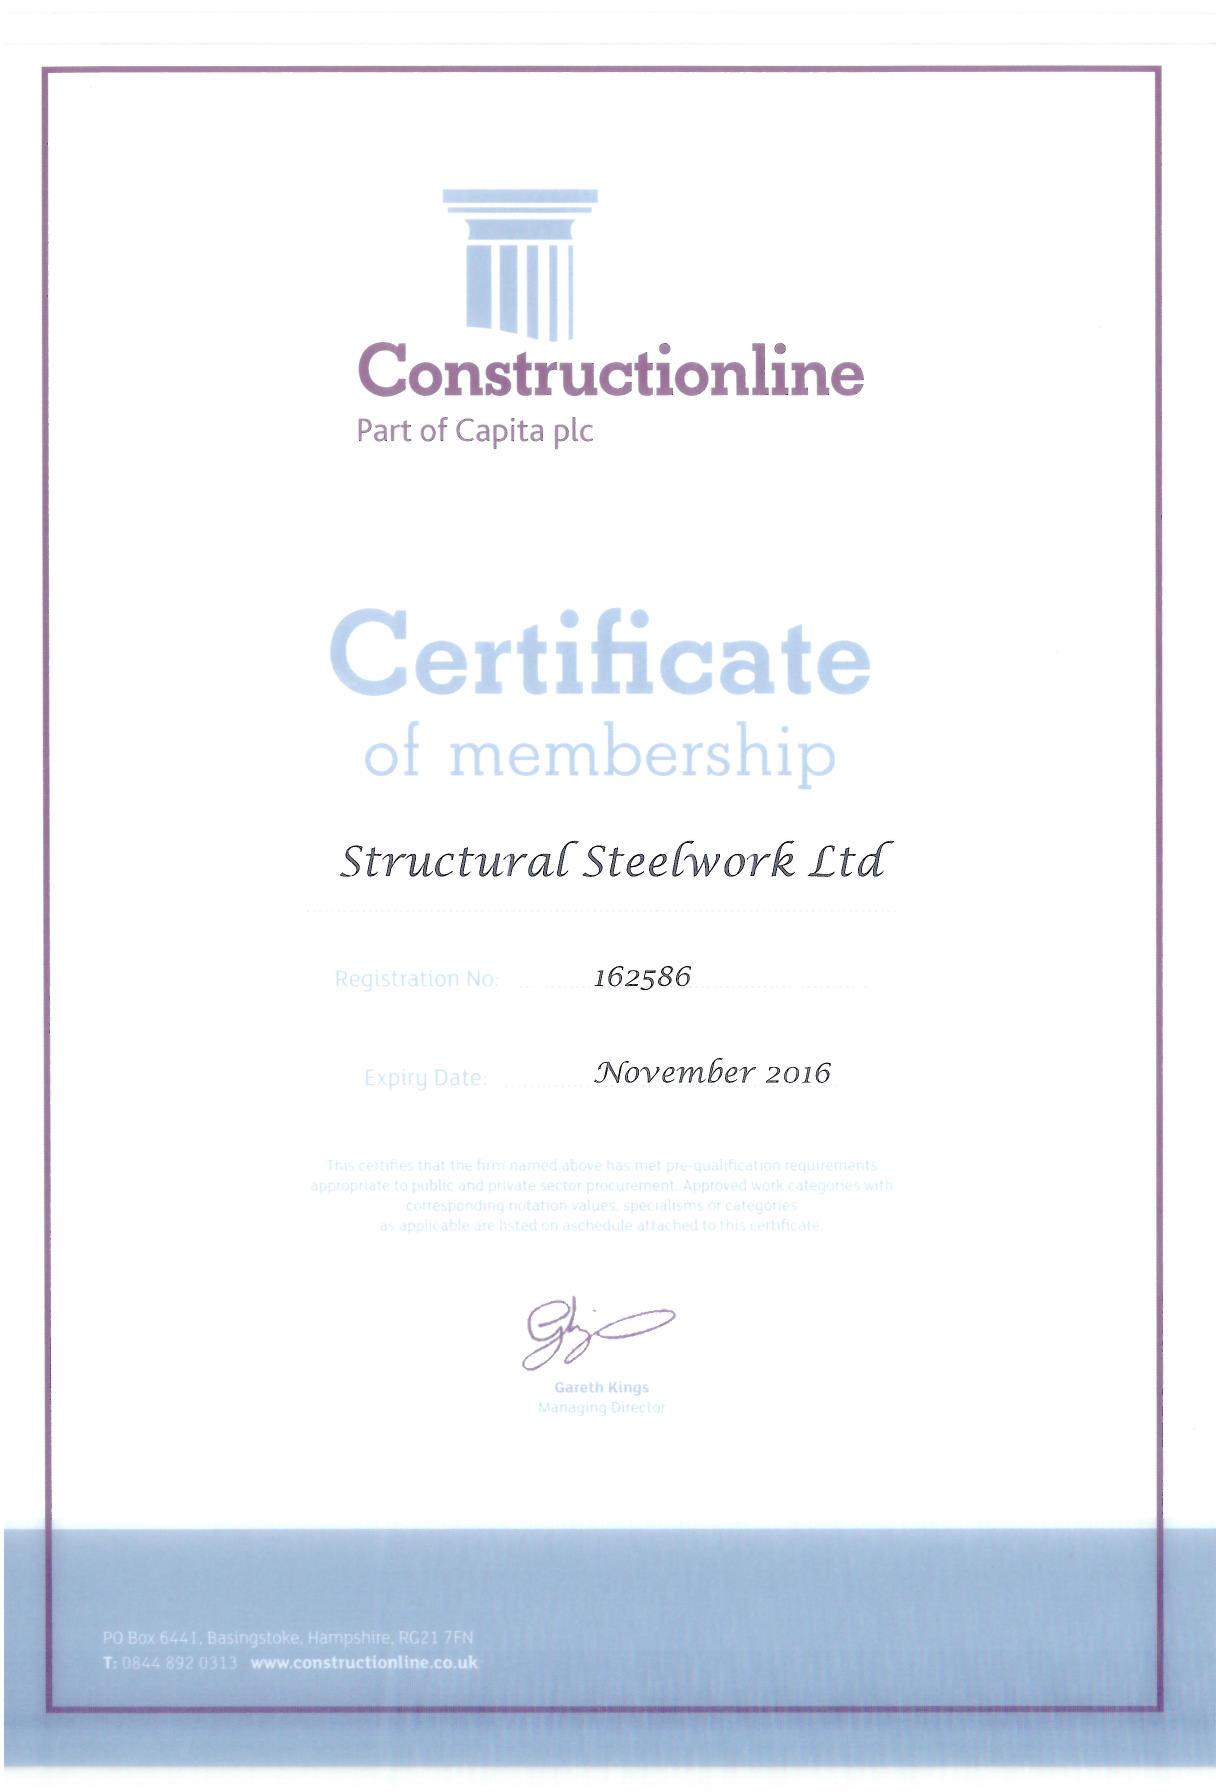 Constructionline Certificate 2016